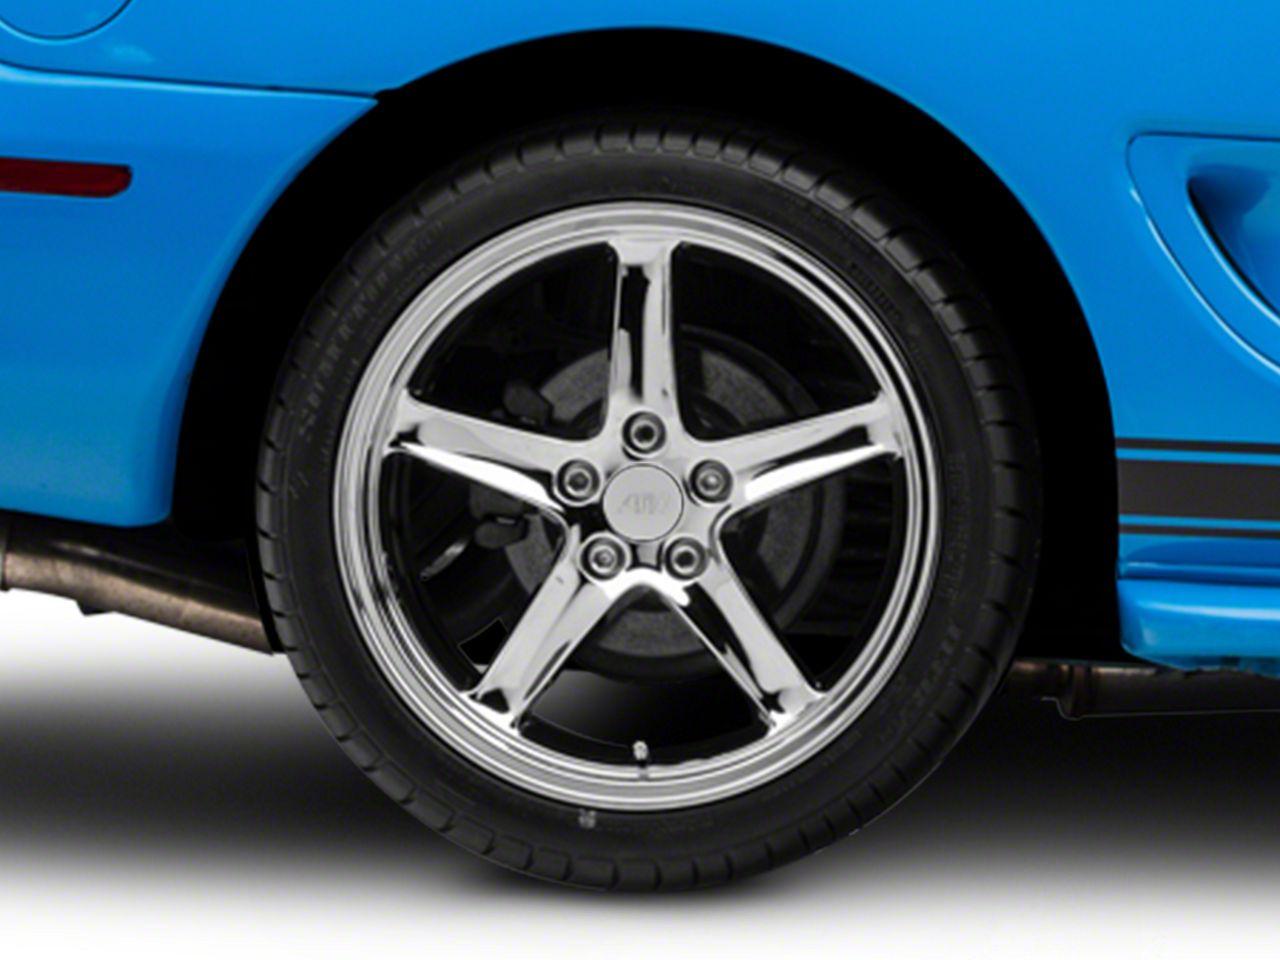 Deep Dish 1995 Cobra R Style Chrome Wheel - 18x10 - Rear Only (94-04 All)